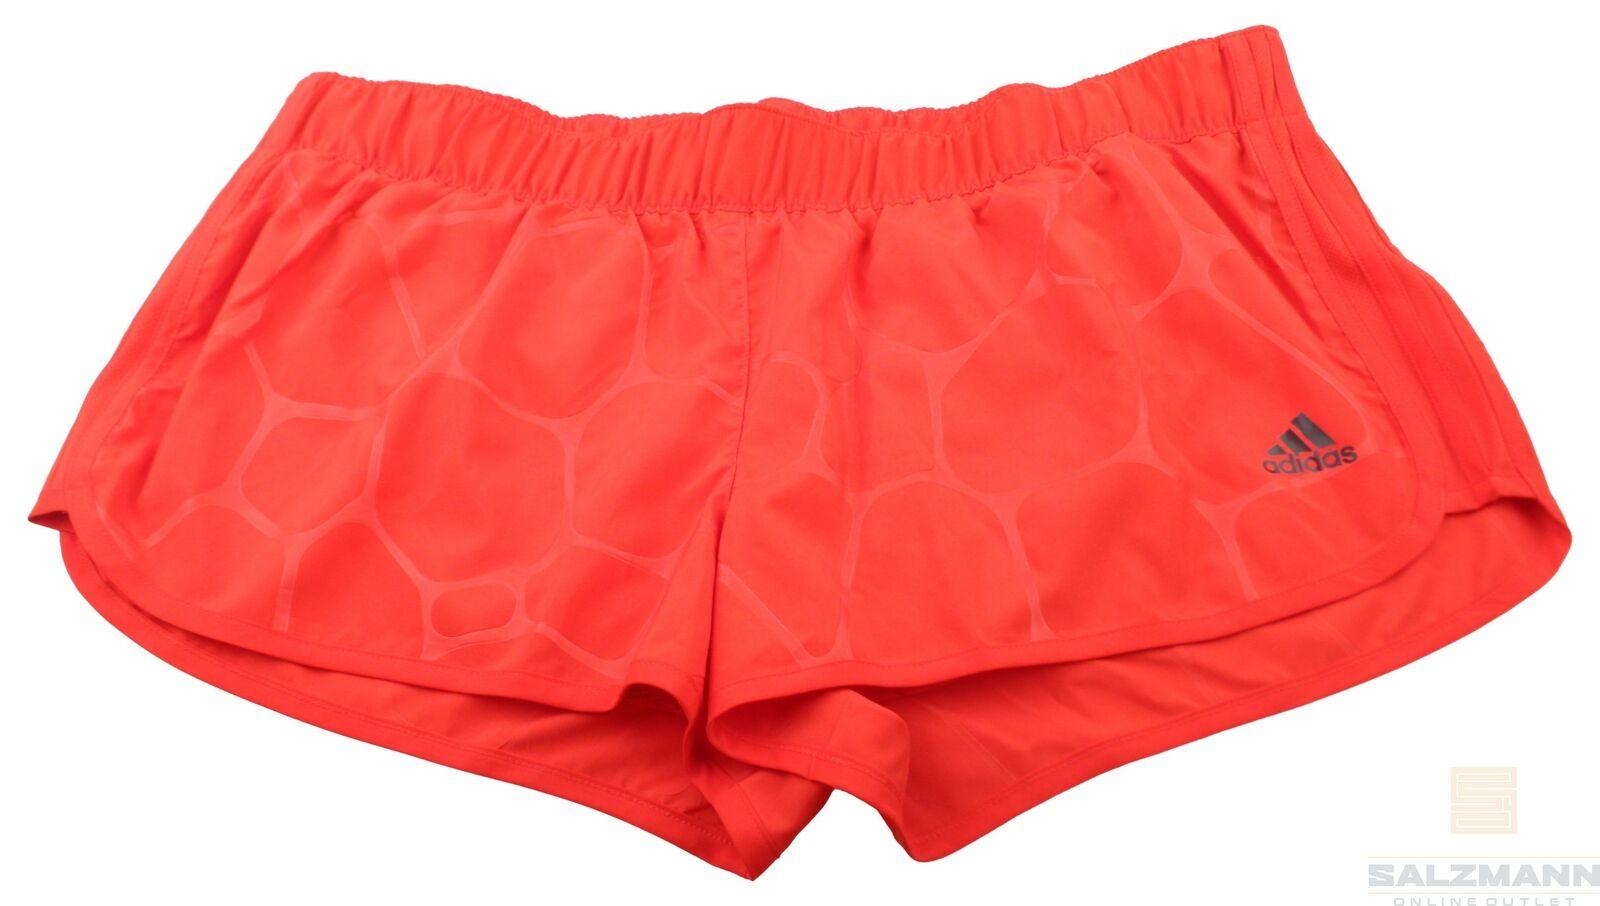 Adidas Damen Shorts Bermuda Gr. L Rot Neu